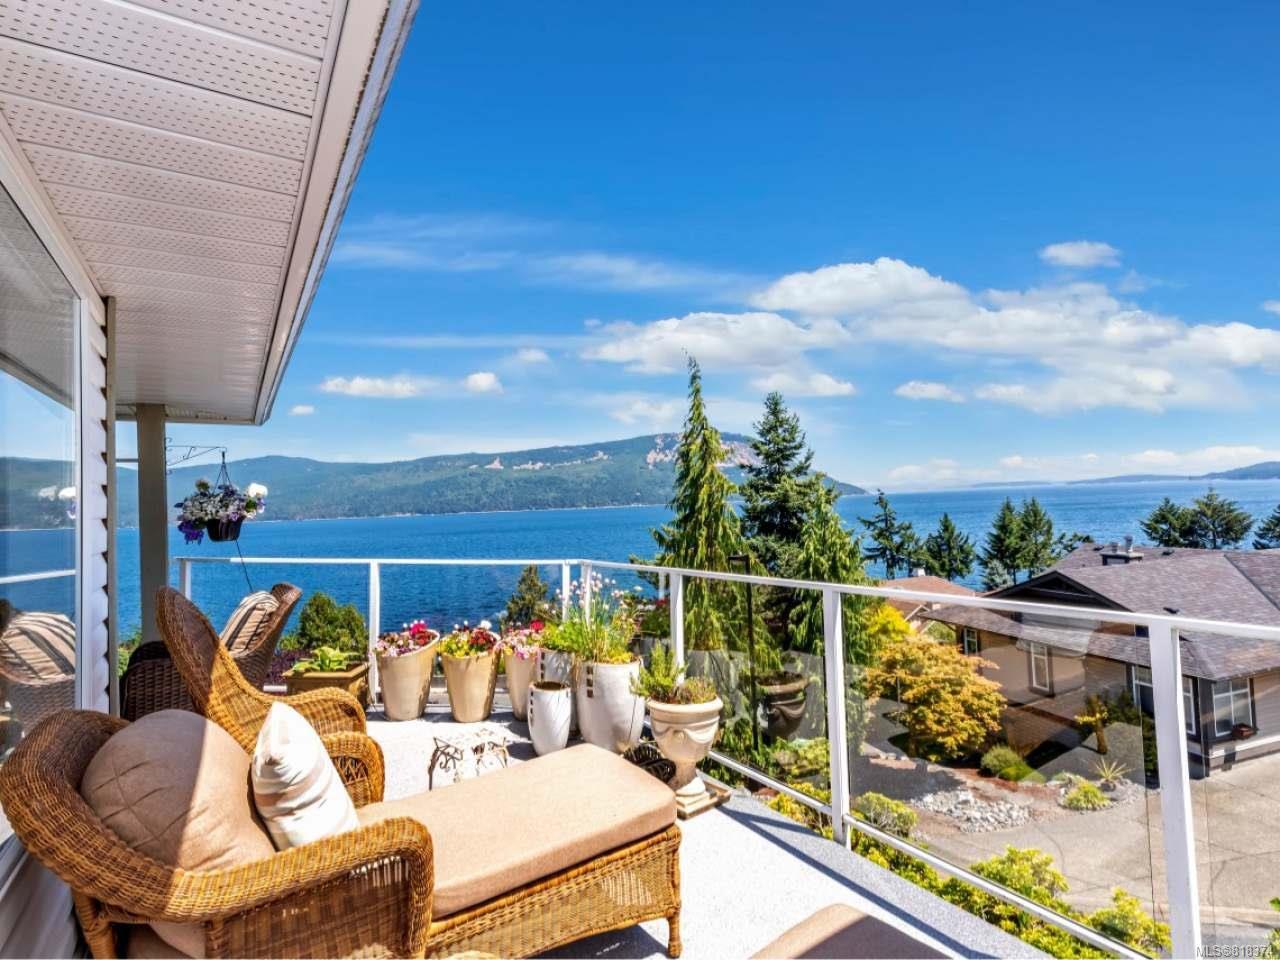 Main Photo: 3717 Marine Vista in COBBLE HILL: ML Cobble Hill House for sale (Malahat & Area)  : MLS®# 818374